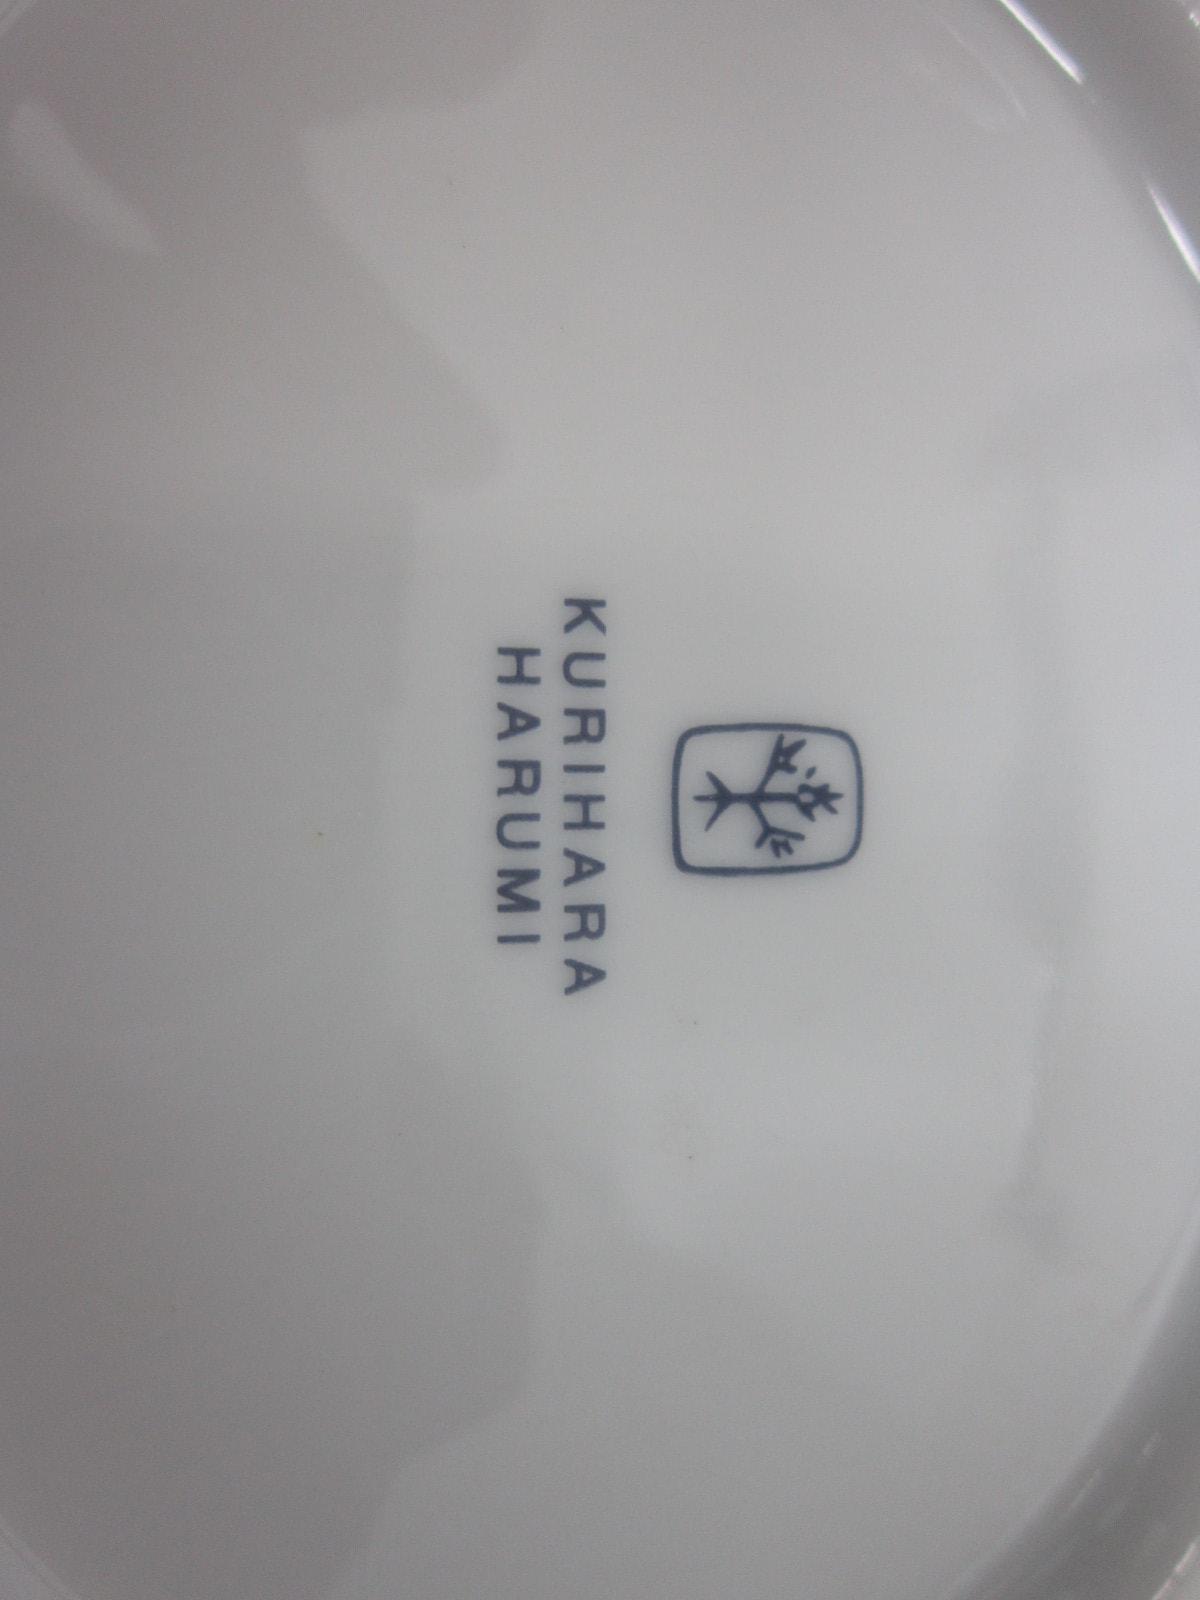 KURIHARA HARUMI(クリハラハルミ)の食器